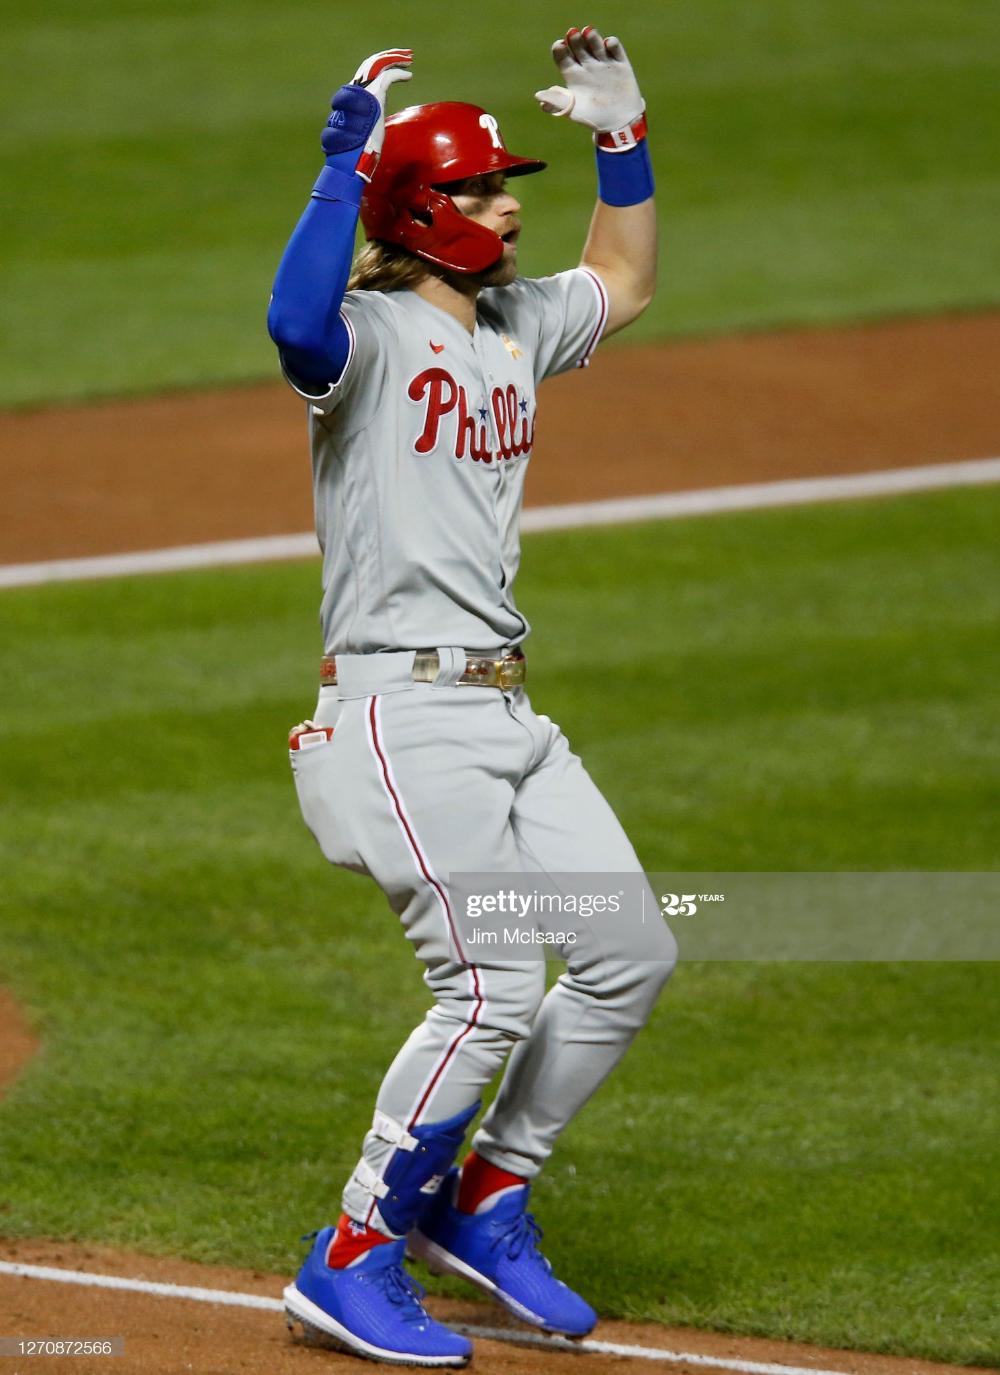 Bryce Harper Of The Philadelphia Phillies Reacts After A Ball Was Philadelphia Phillies Bryce Harper Phillies